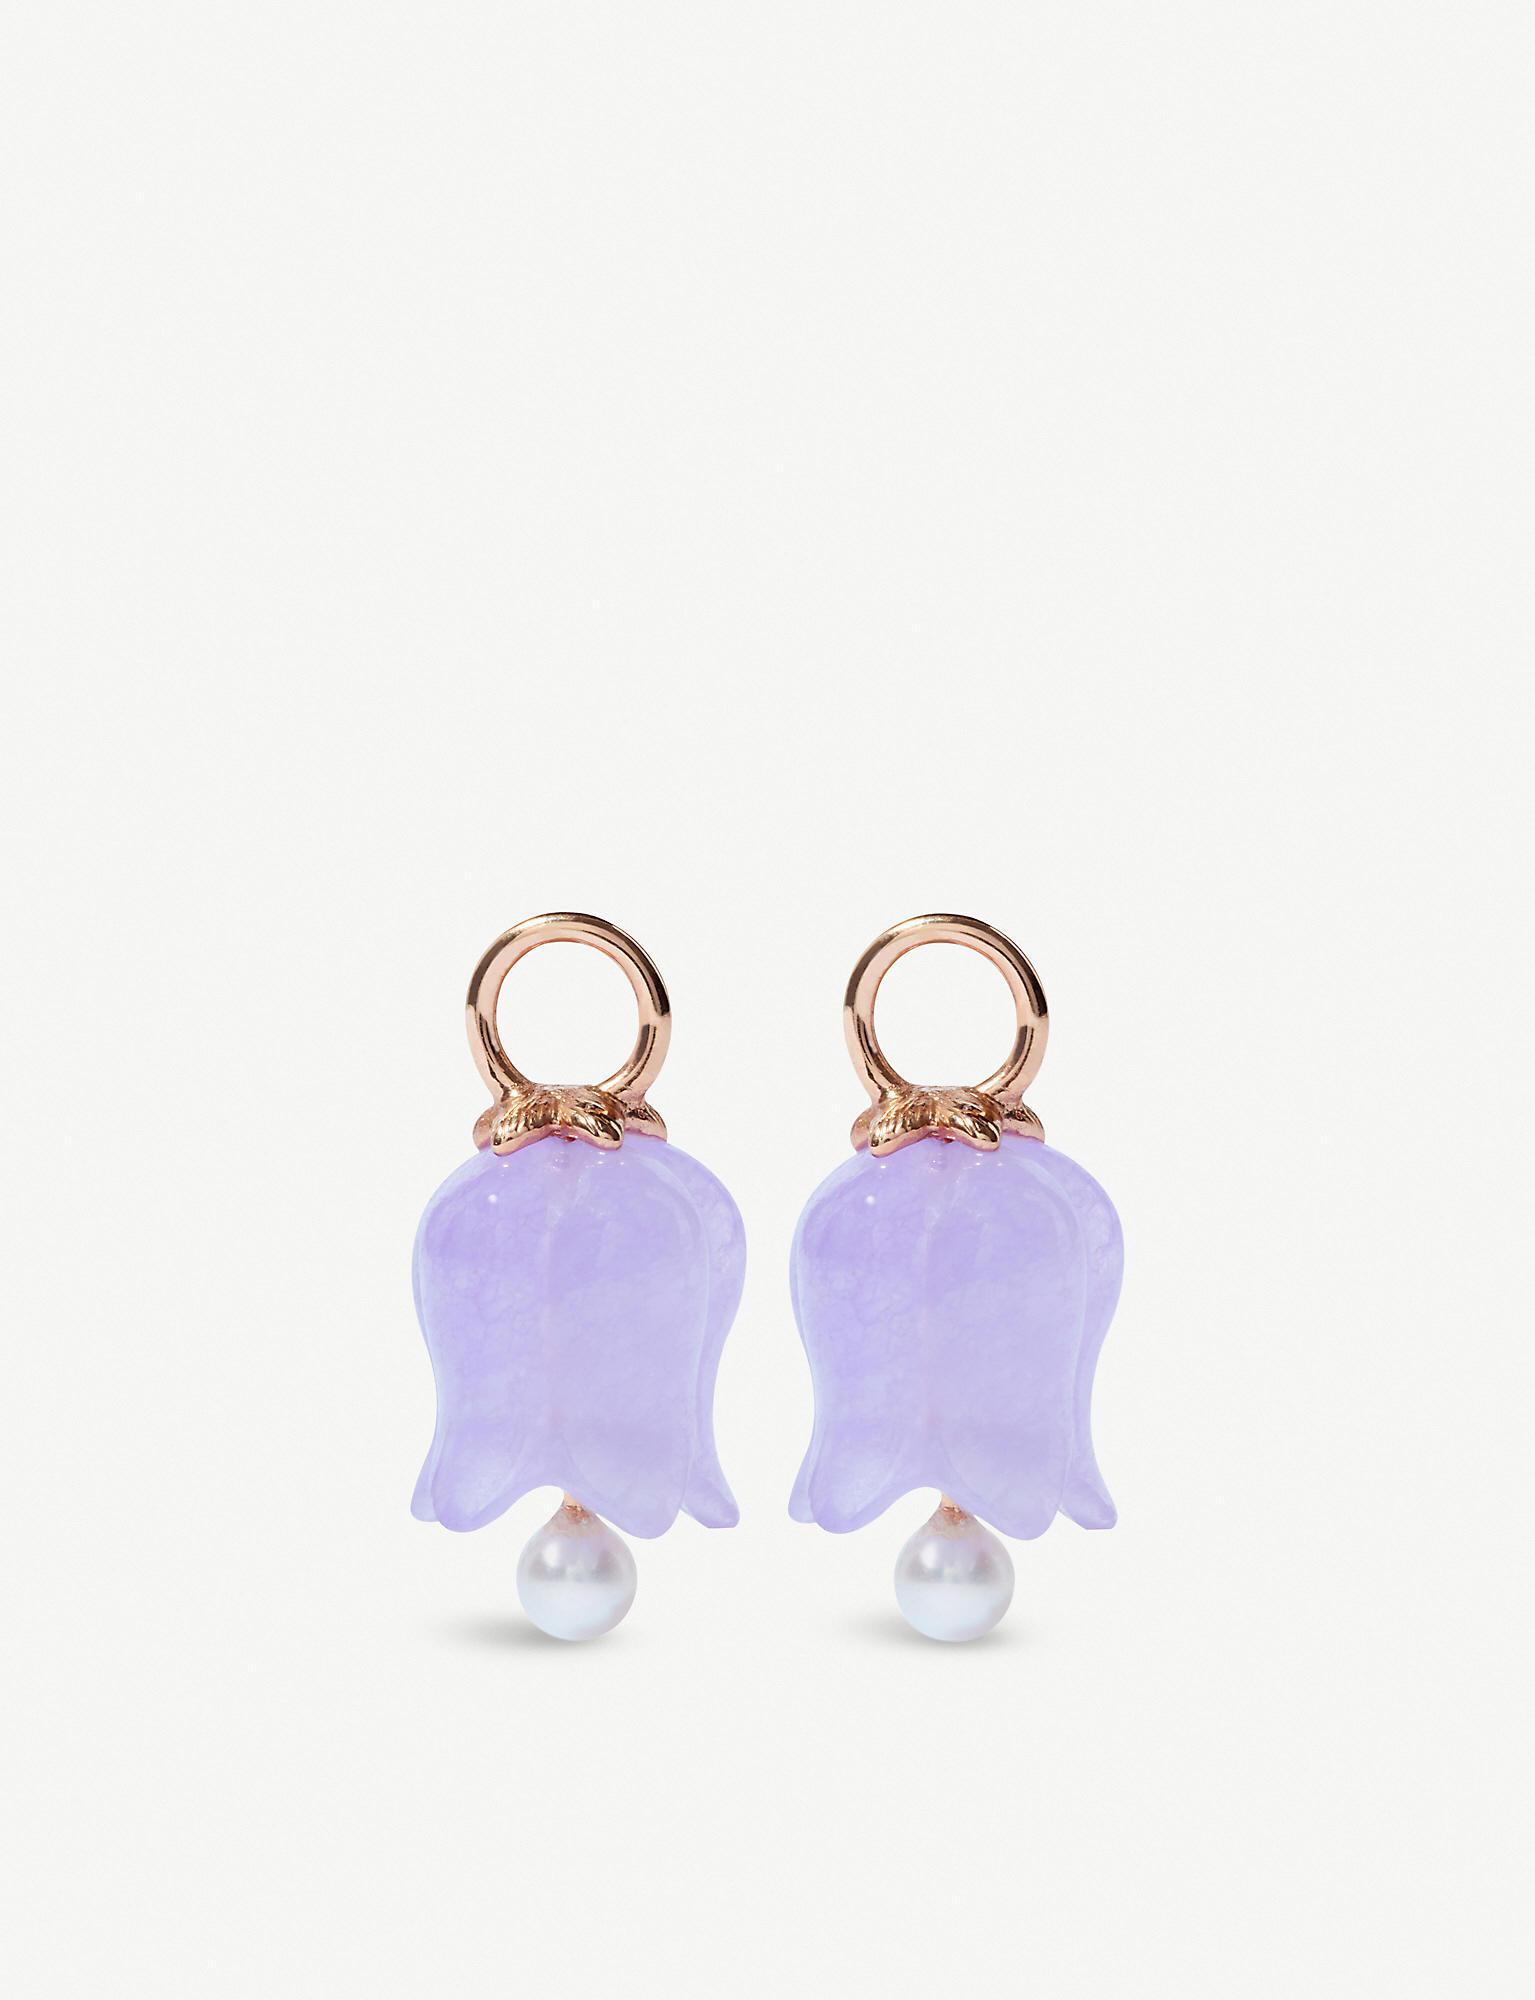 Annoushka 18ct Rose Gold Lavender Jade Tulip Earring Drops